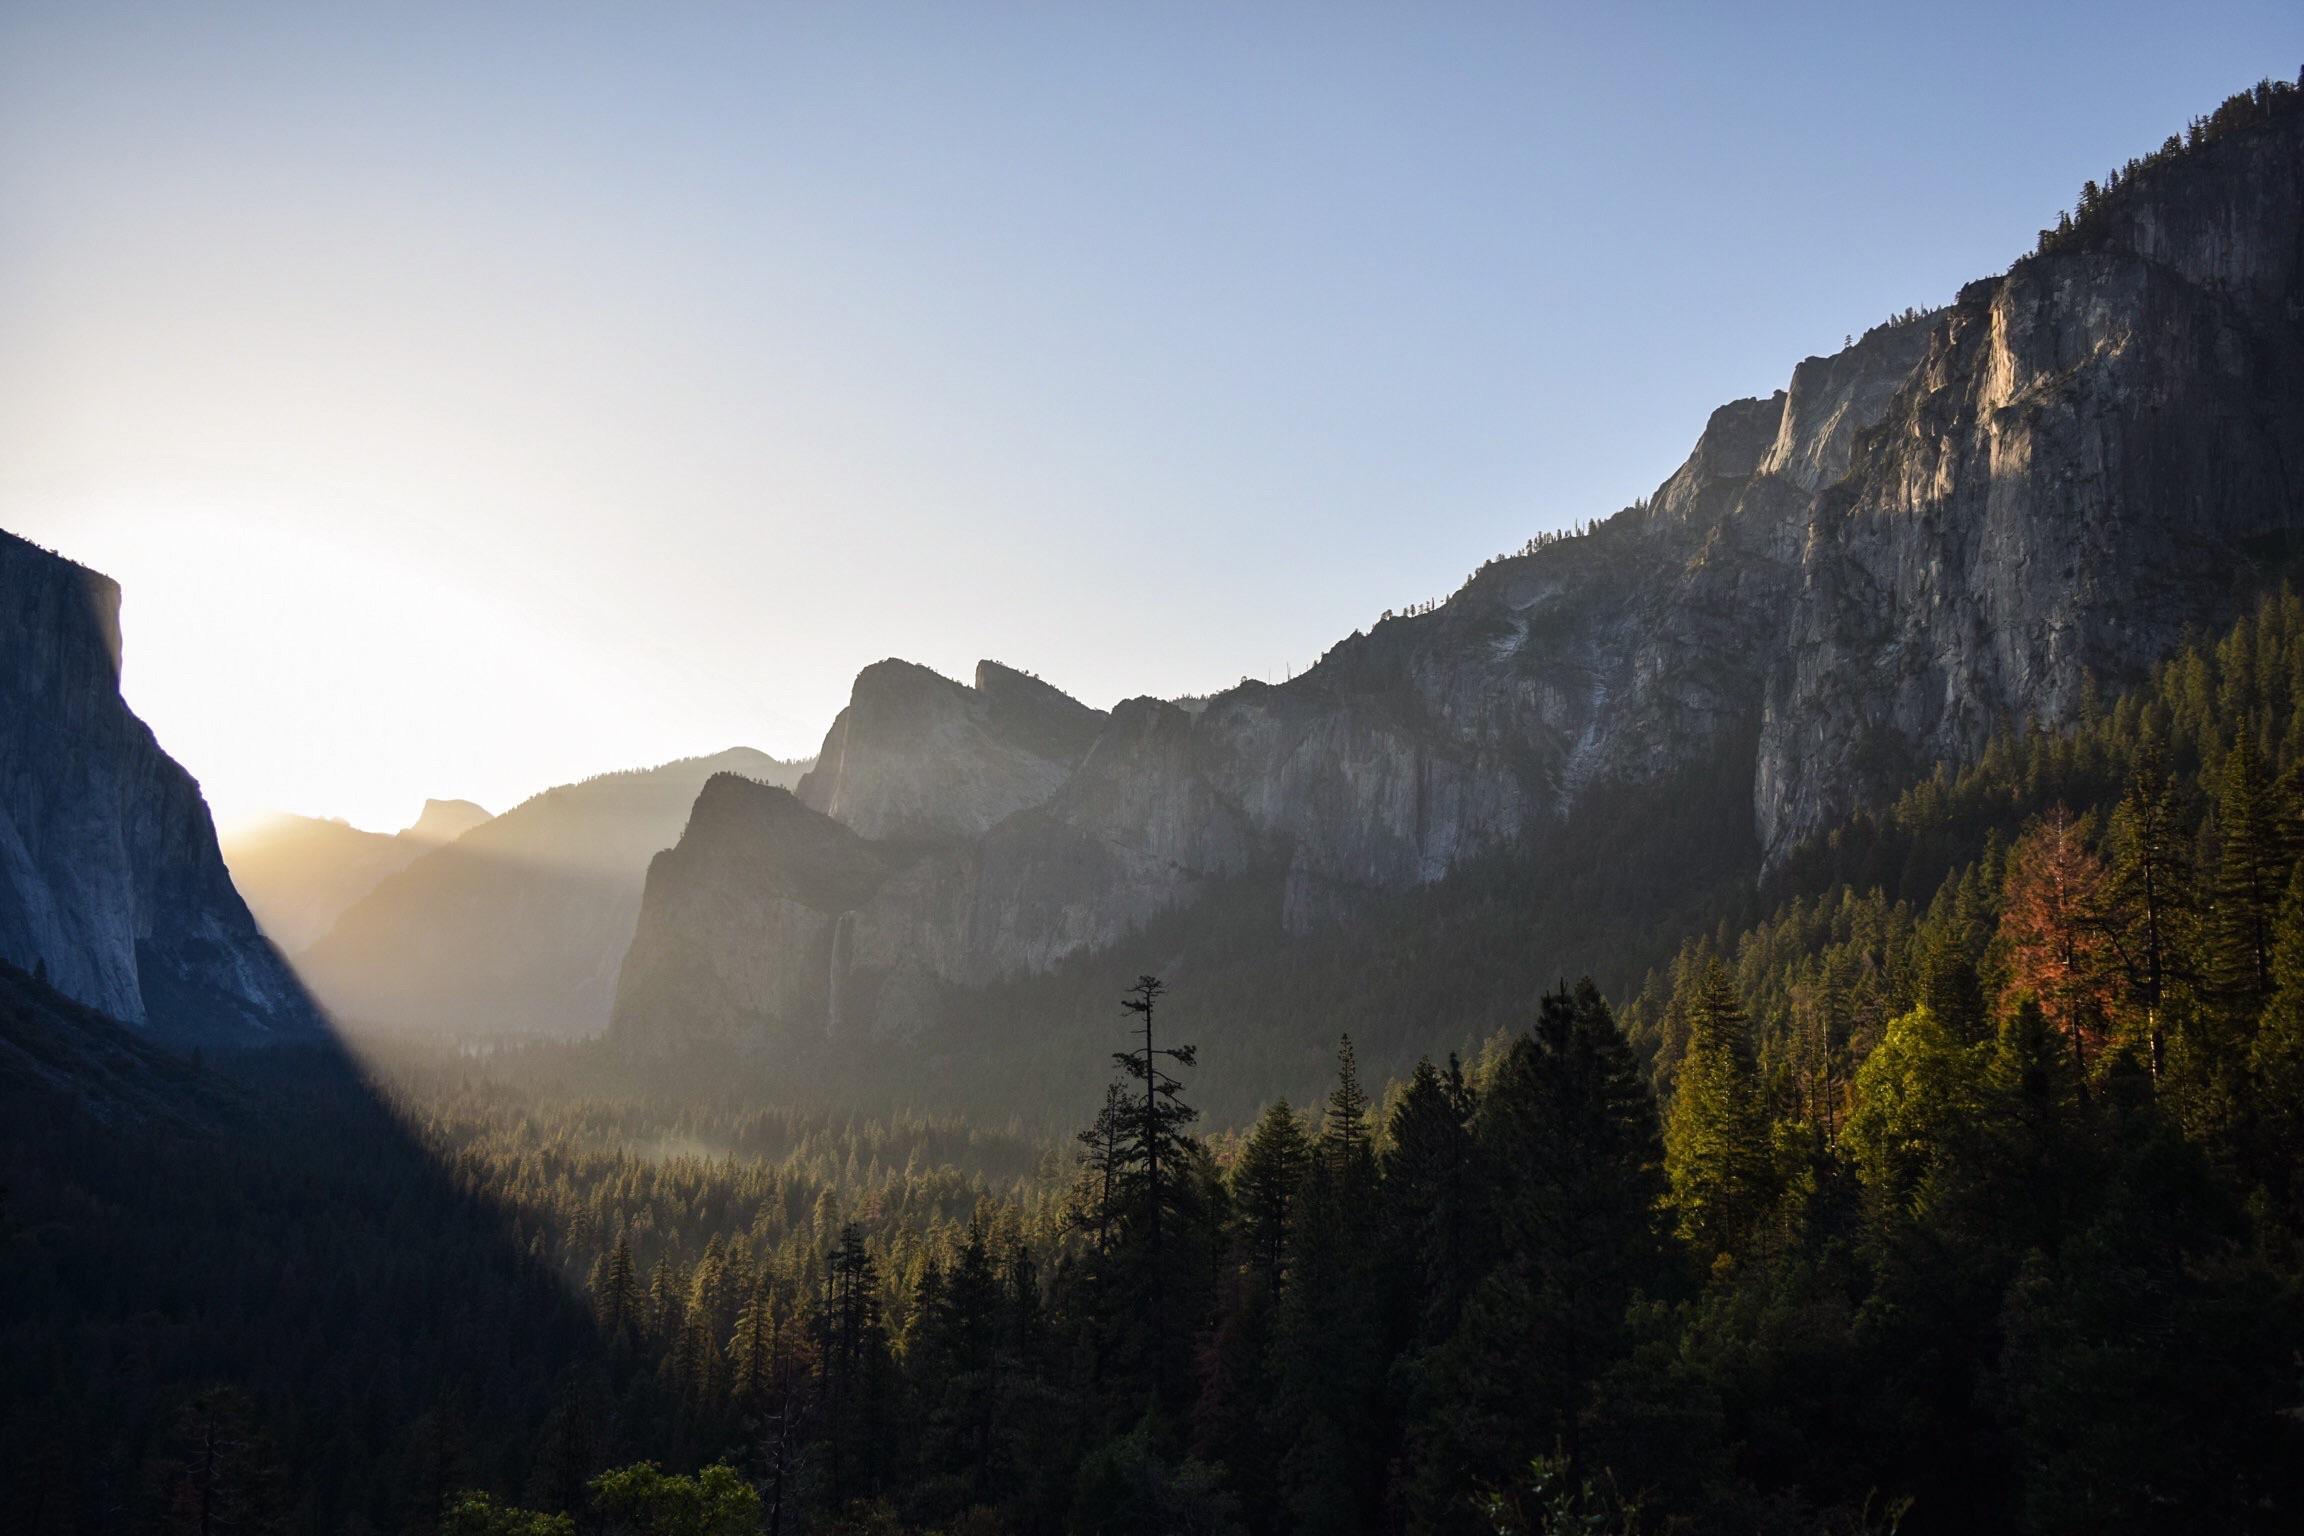 Yosemite - Tunnel View sunrise